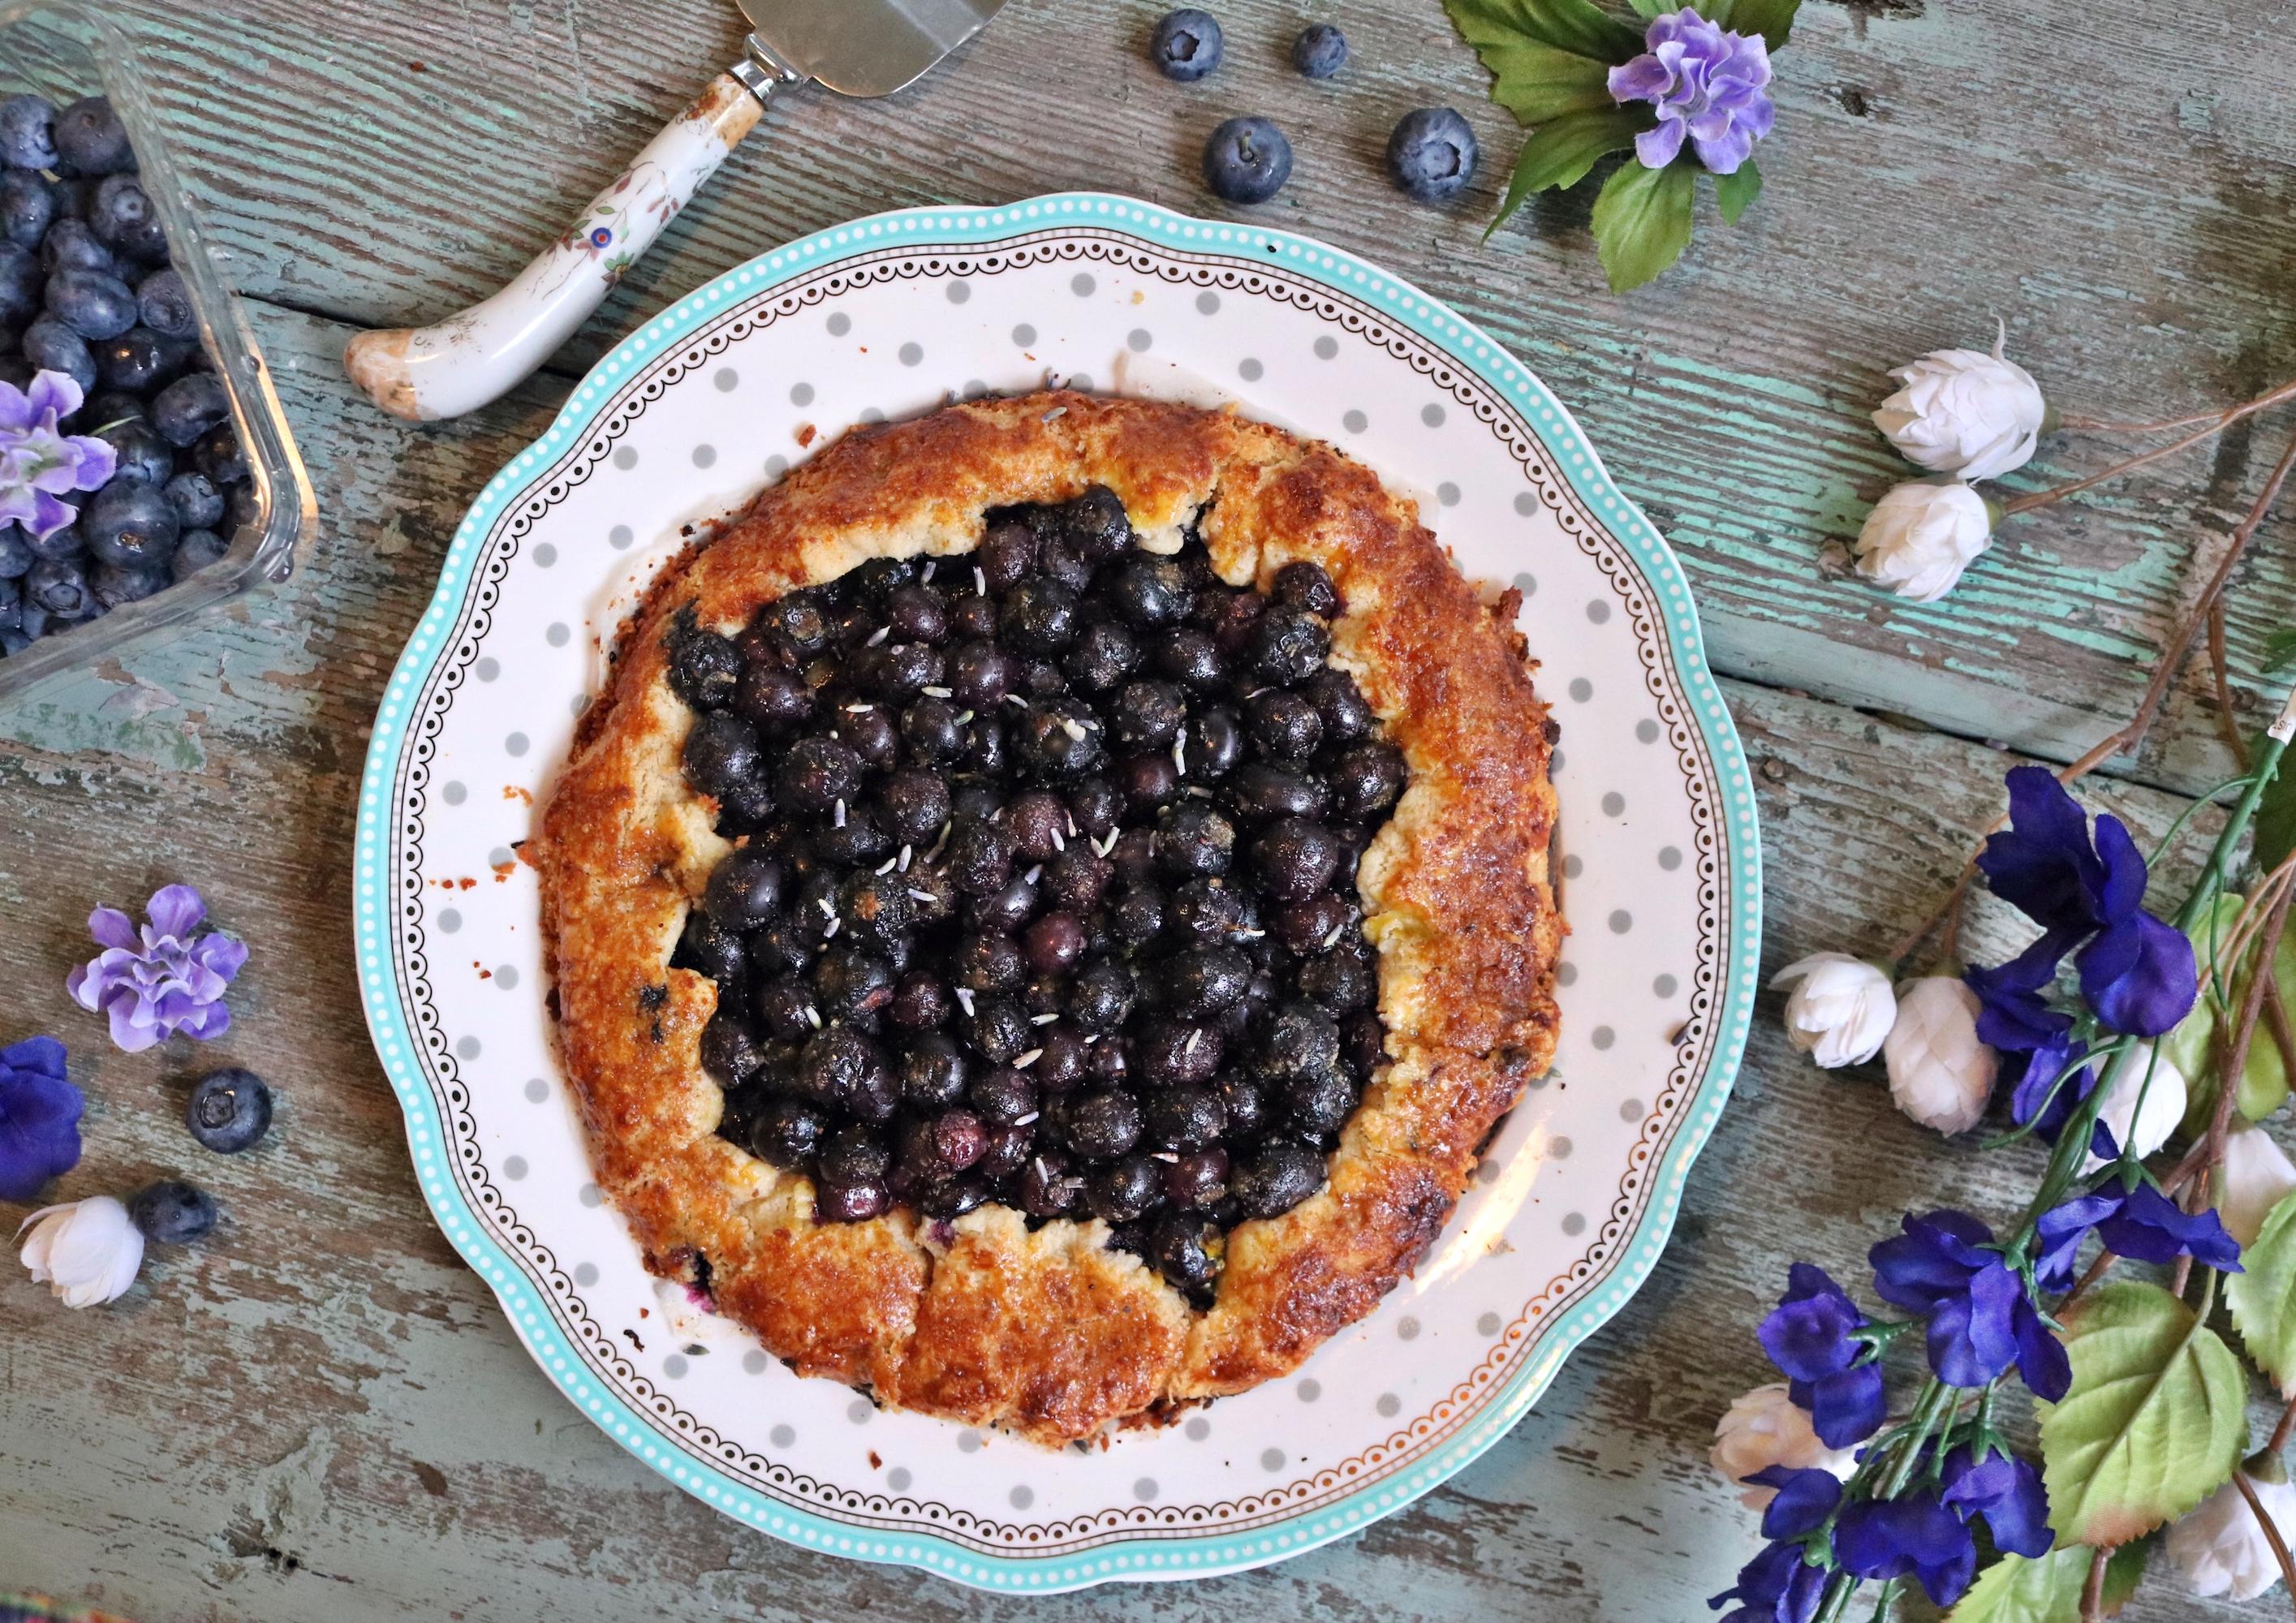 Blueberry, Lemon, and Lavender Galette